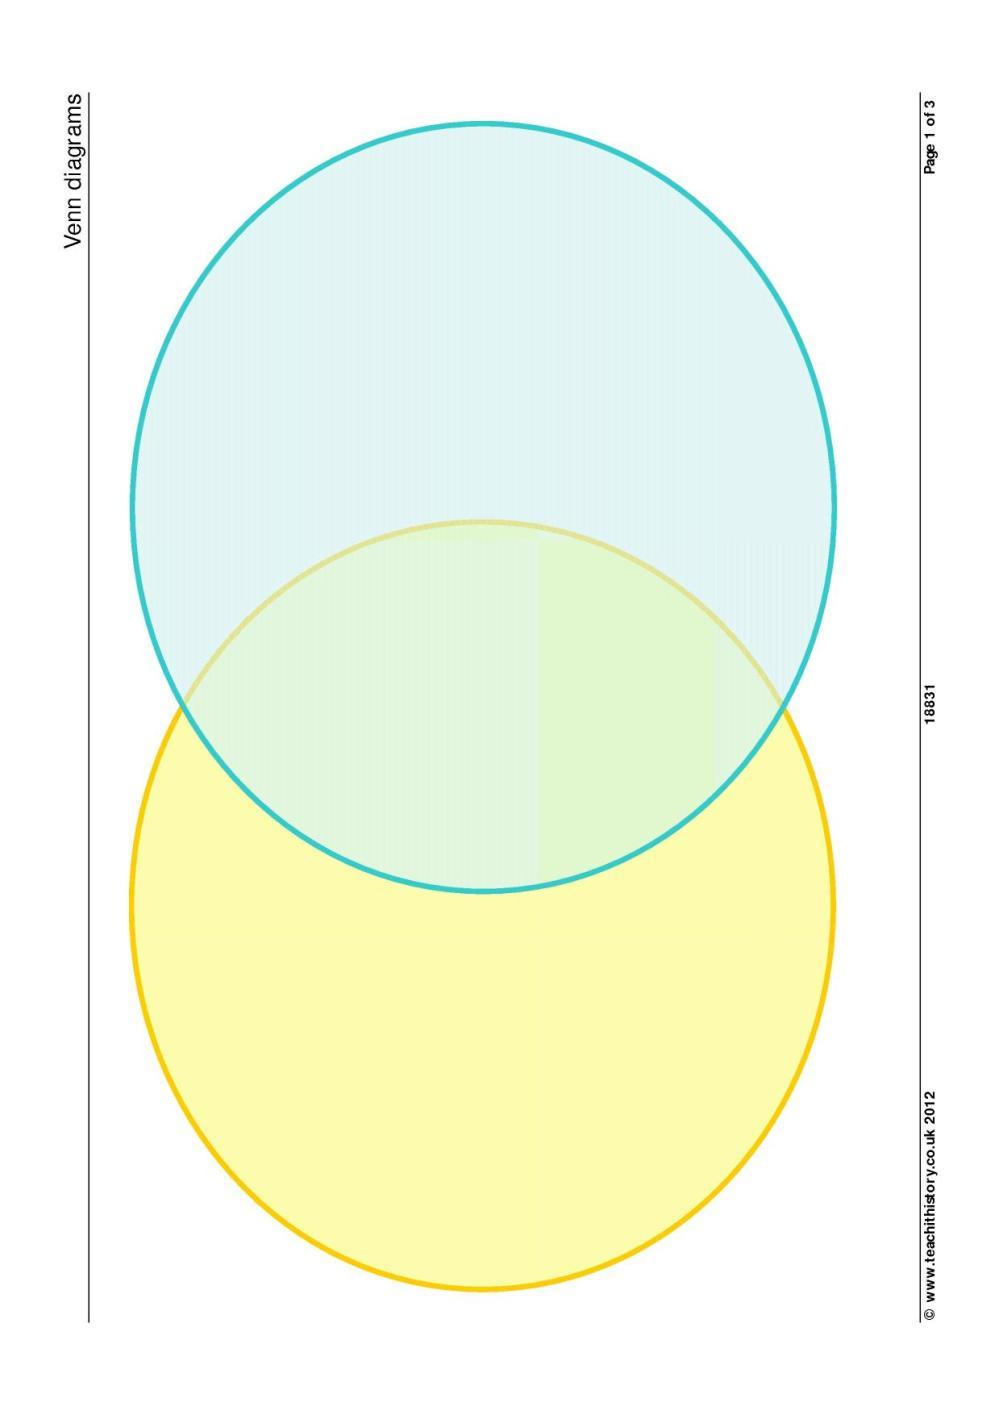 medium resolution of venn diagrams teaching templates and tools